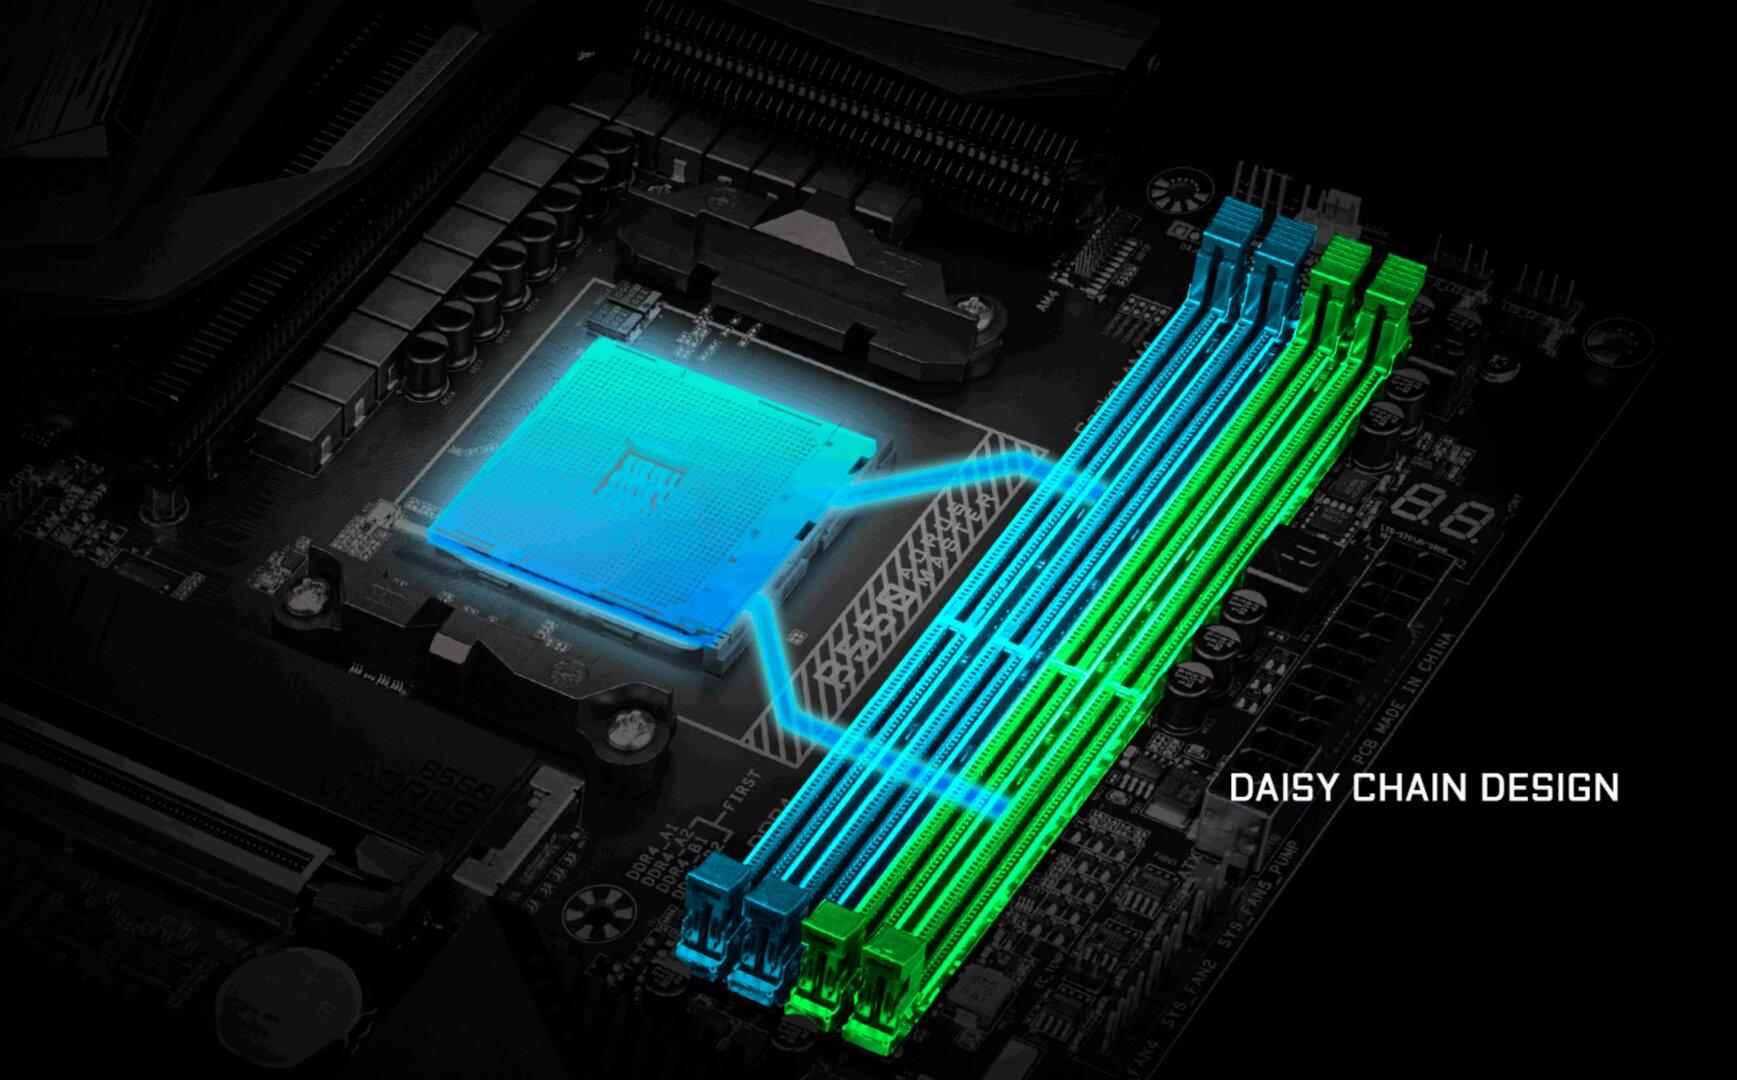 Gigabyte B550 Aorus Elite - DDR4-DIMMs im Daisy-Chain-Design angebunden